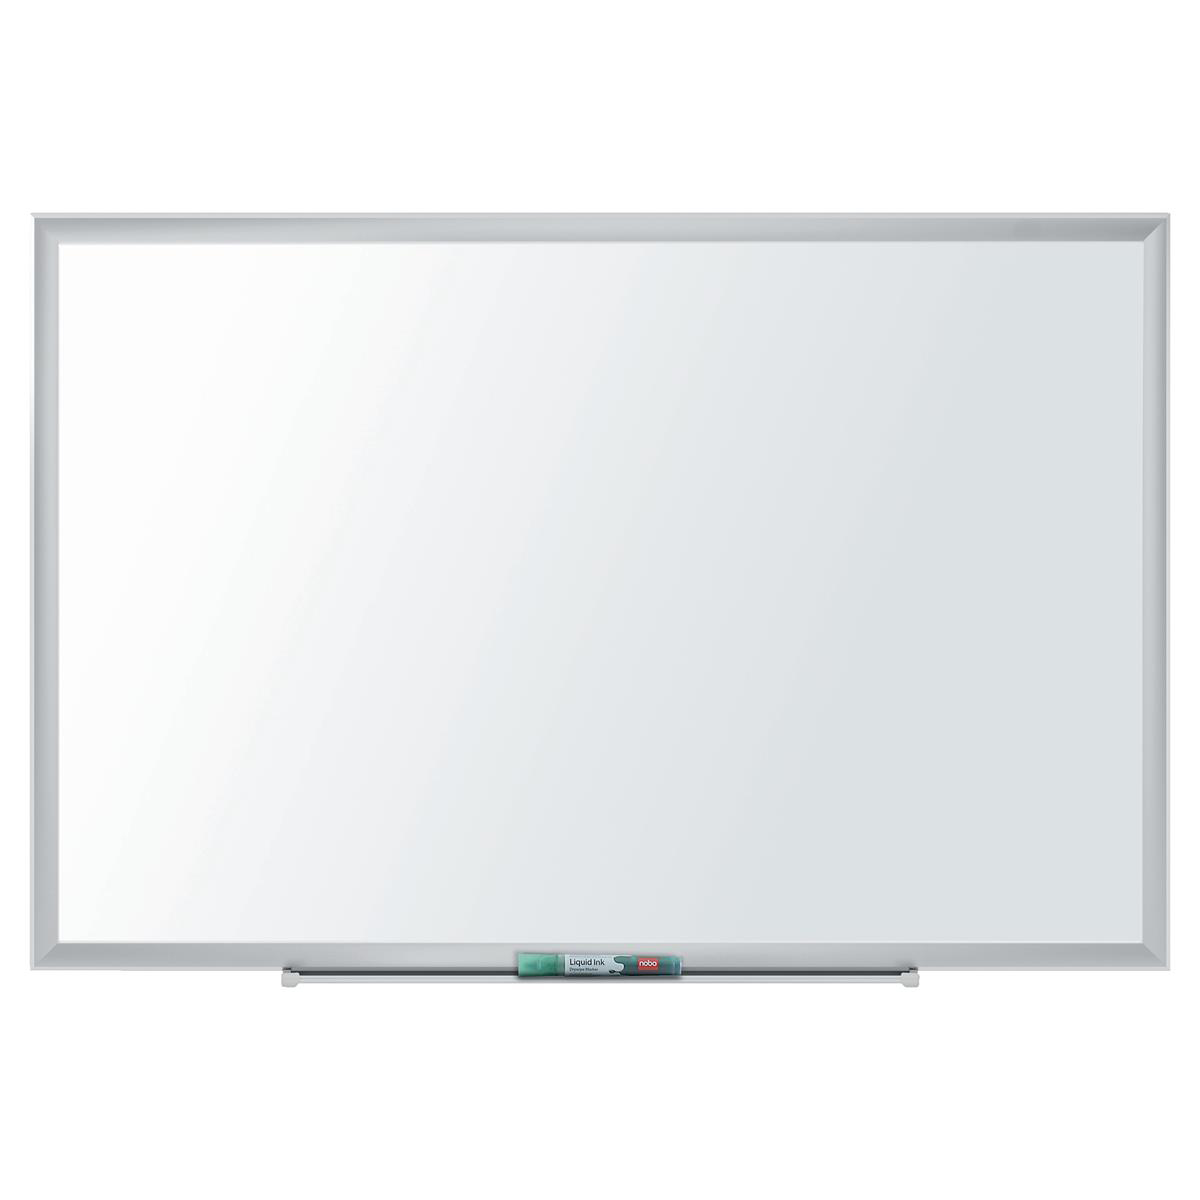 Nobo Nano Clean Steel Whiteboard Magnetic Exclusive Nano Clean Surface W1800xH900mm White Ref 1905170